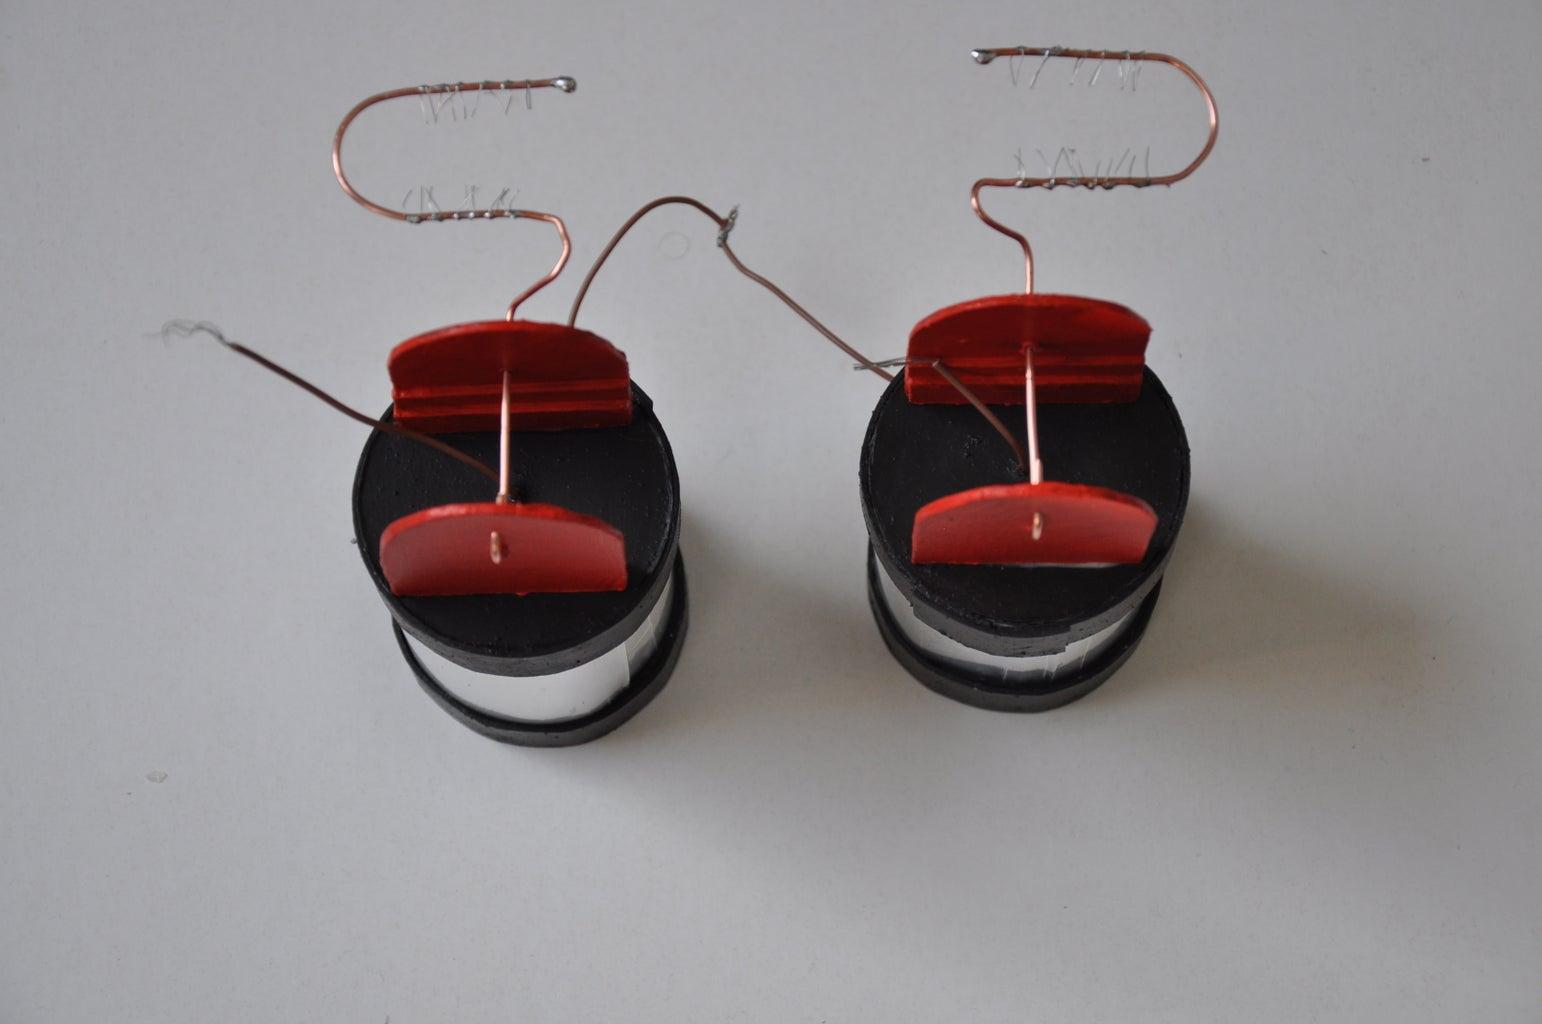 The Leyden Jars